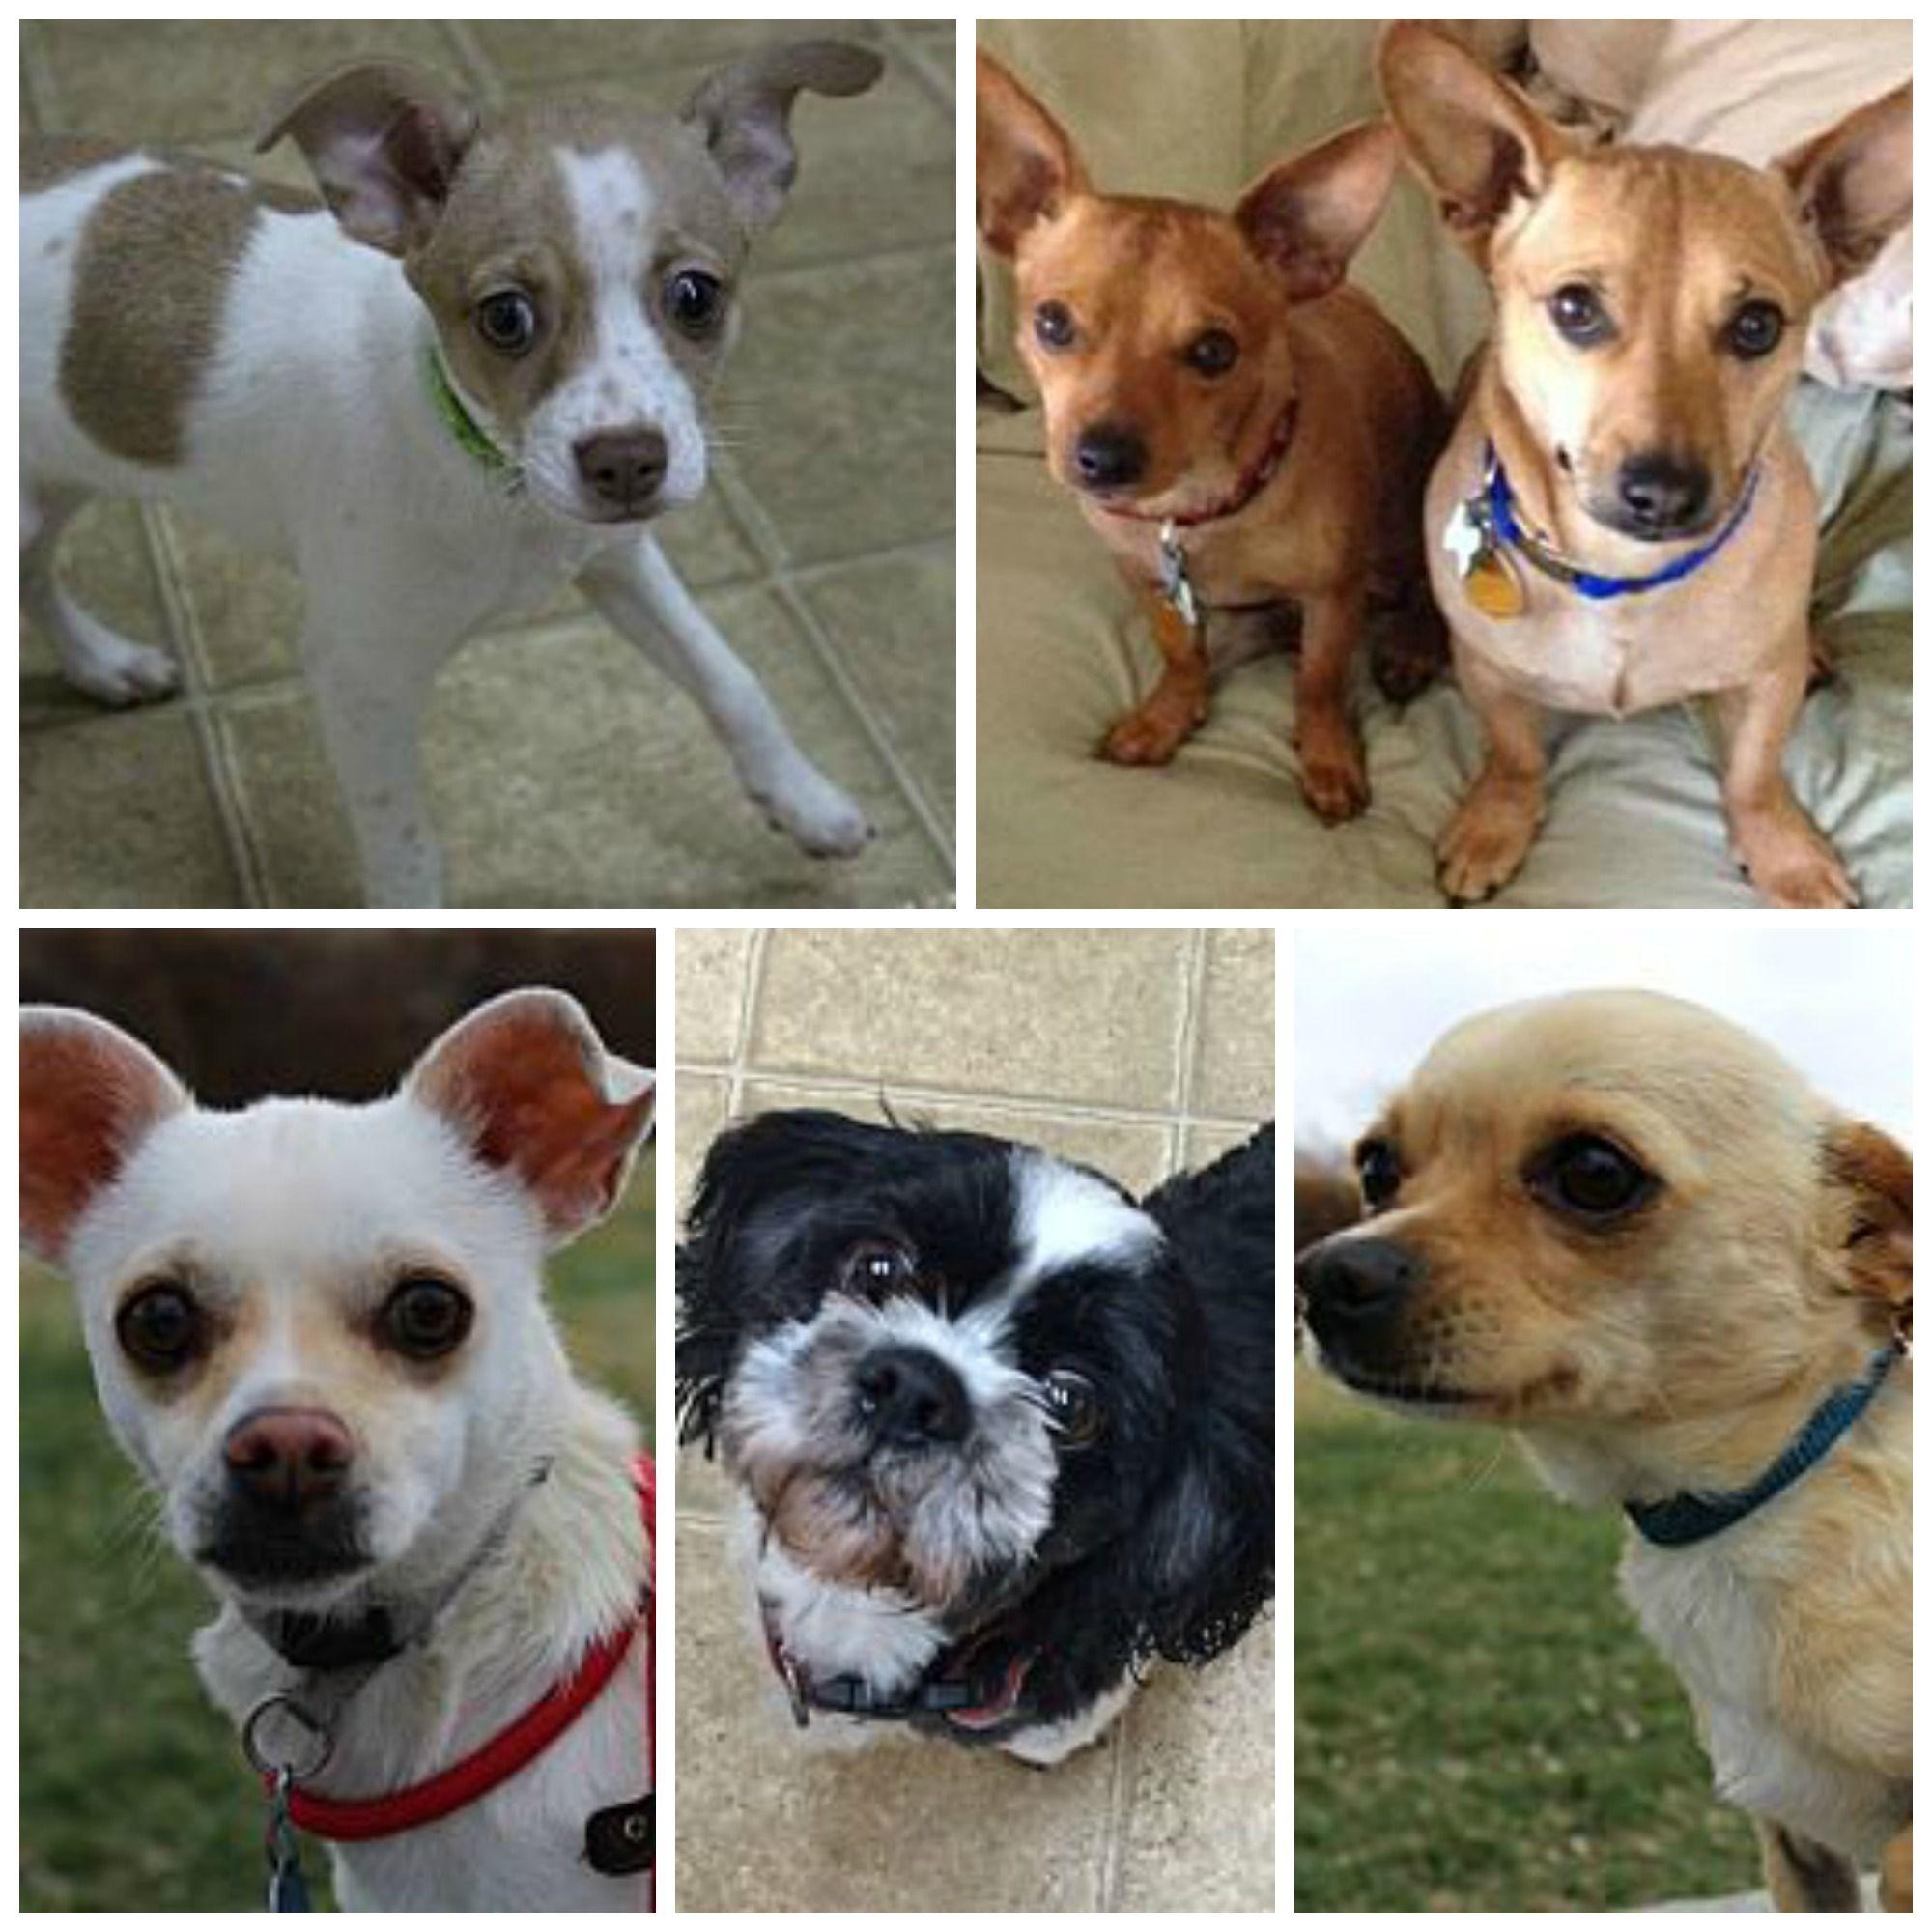 So many wonderful adoptions last week! 14 furkids found